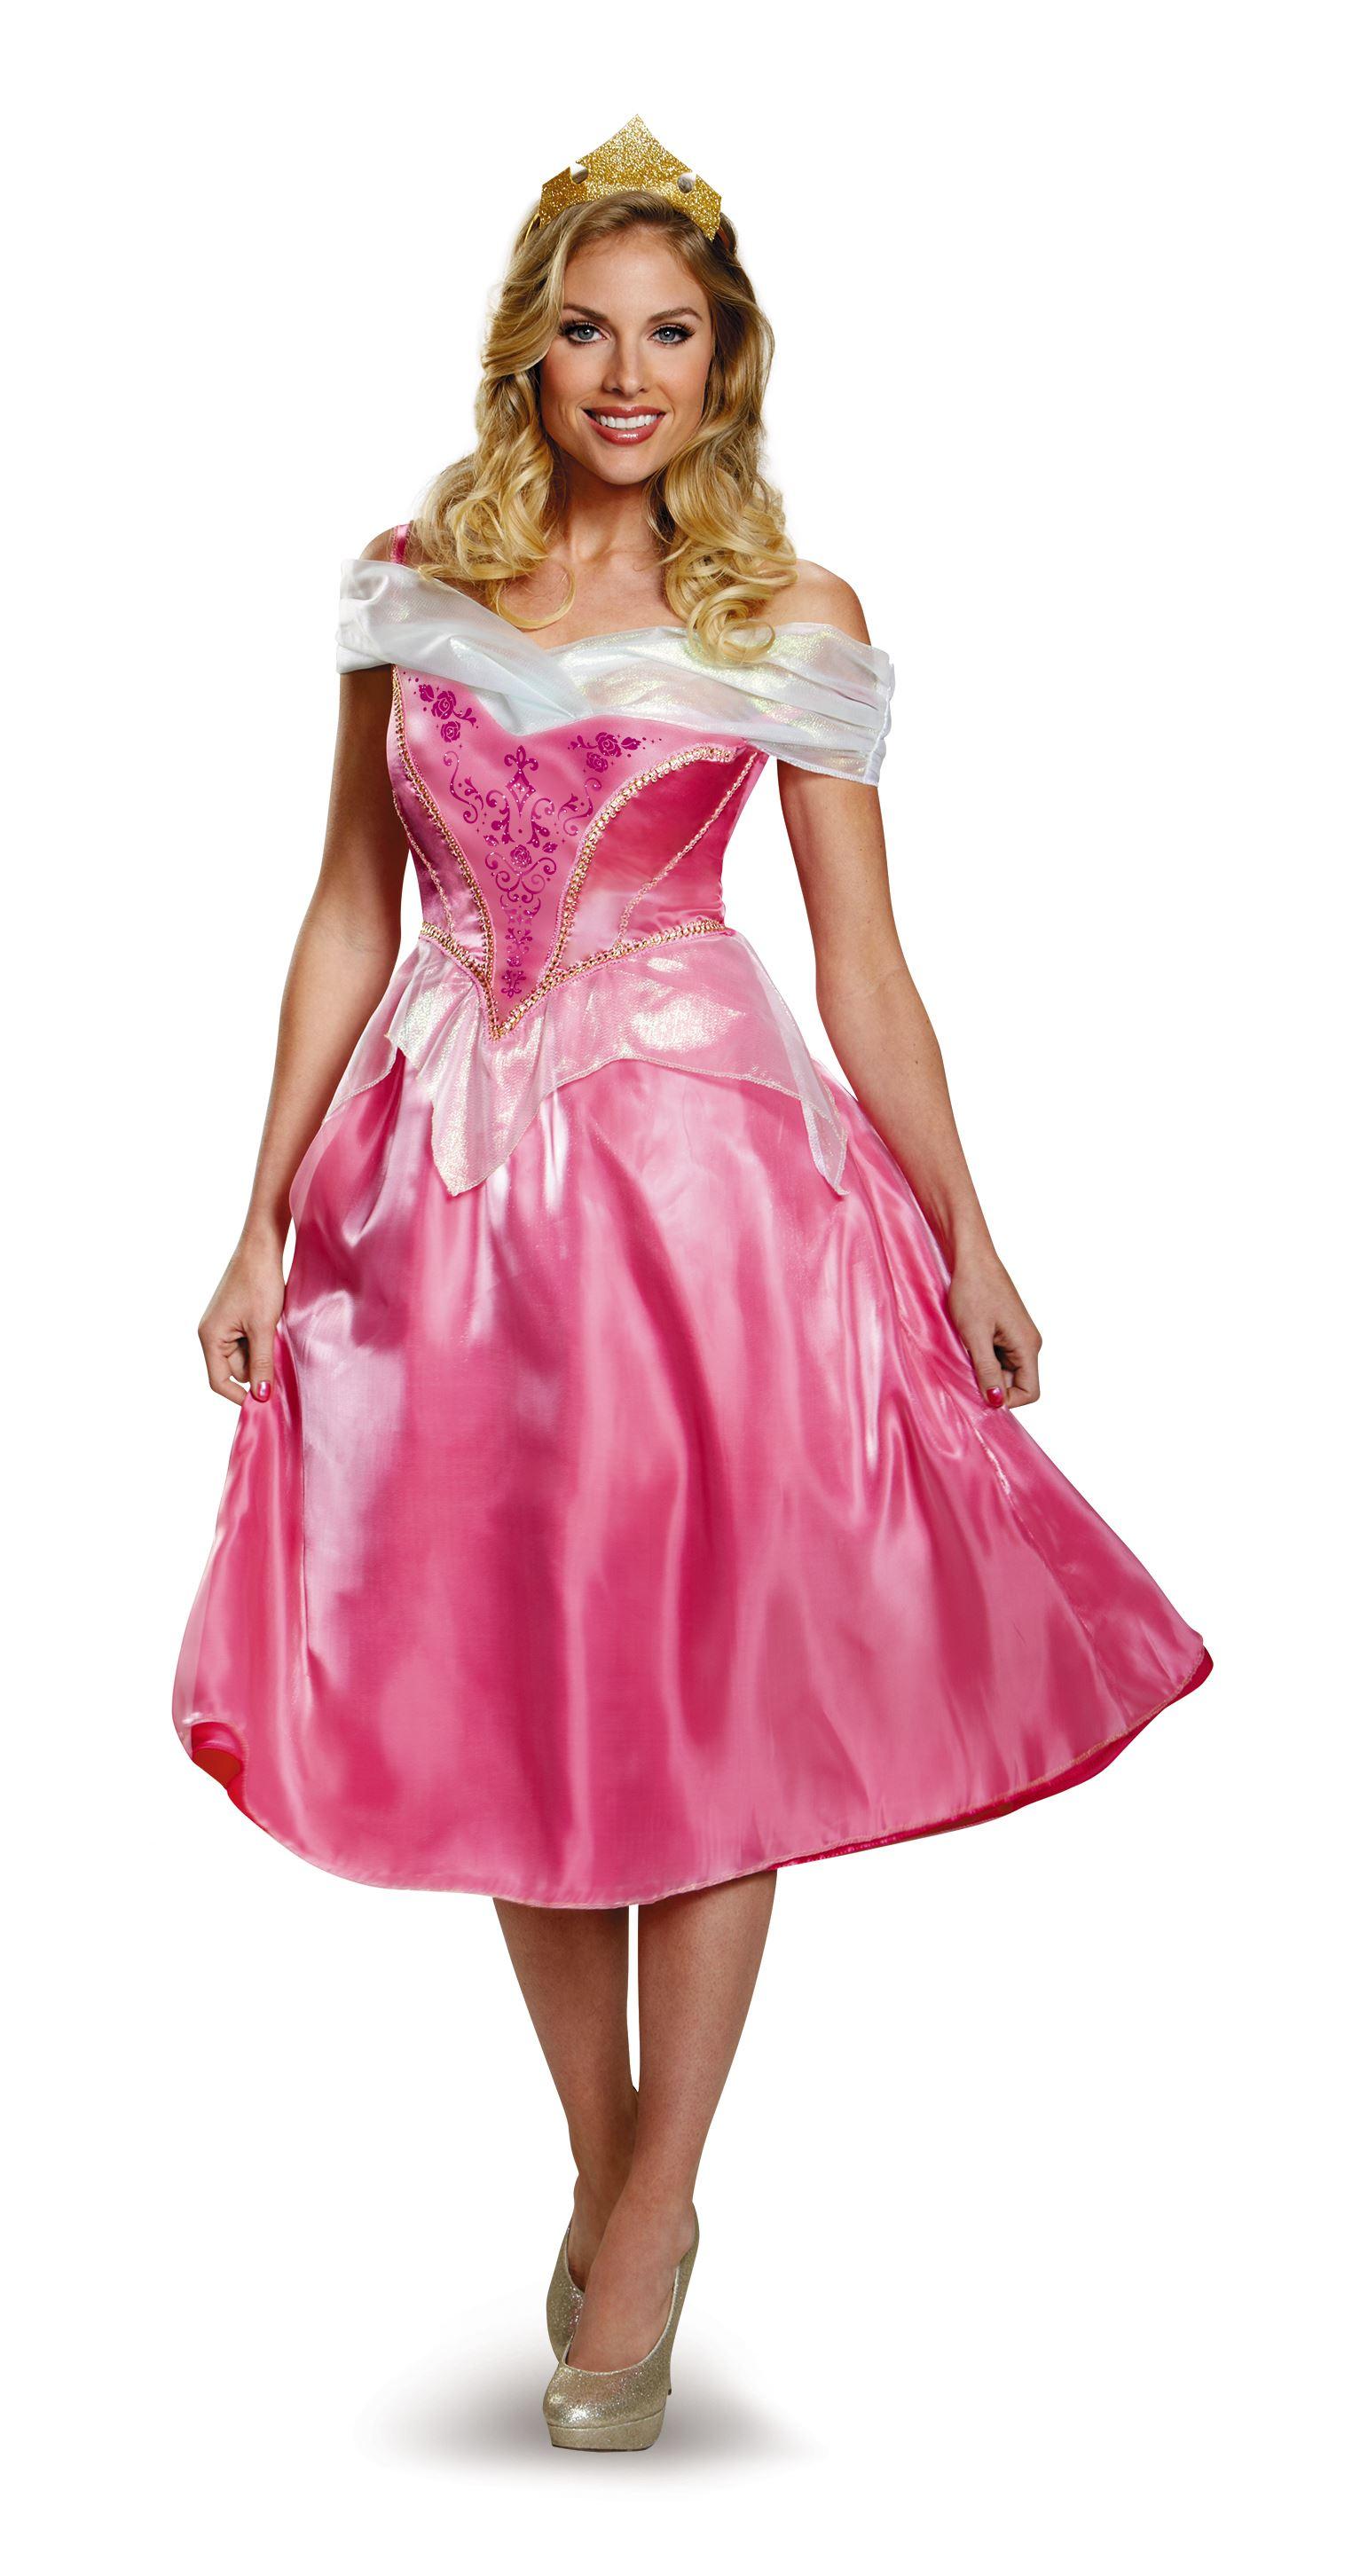 Aurora disney princess adult halloween costume the costume land - Costume princesse disney adulte ...